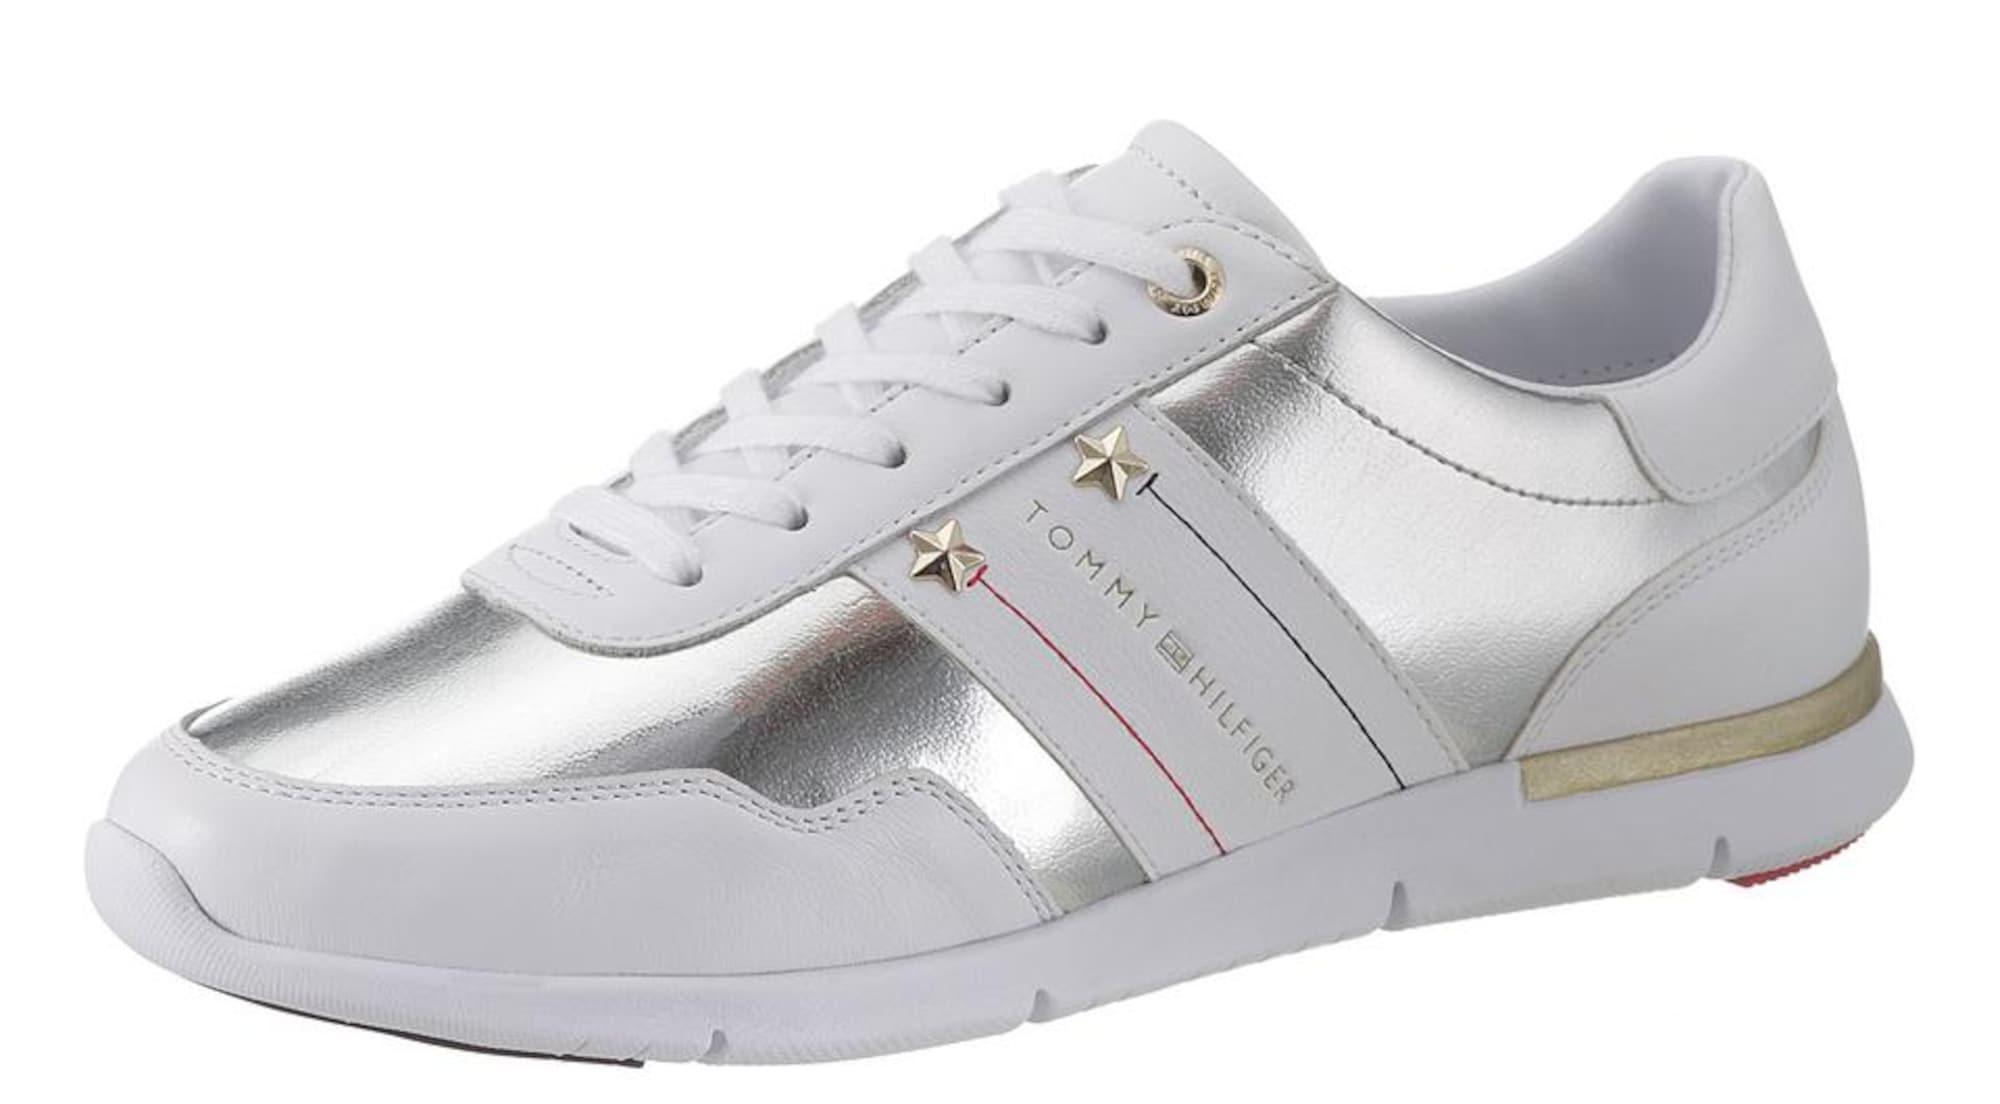 Tenisky stříbrná bílá TOMMY HILFIGER